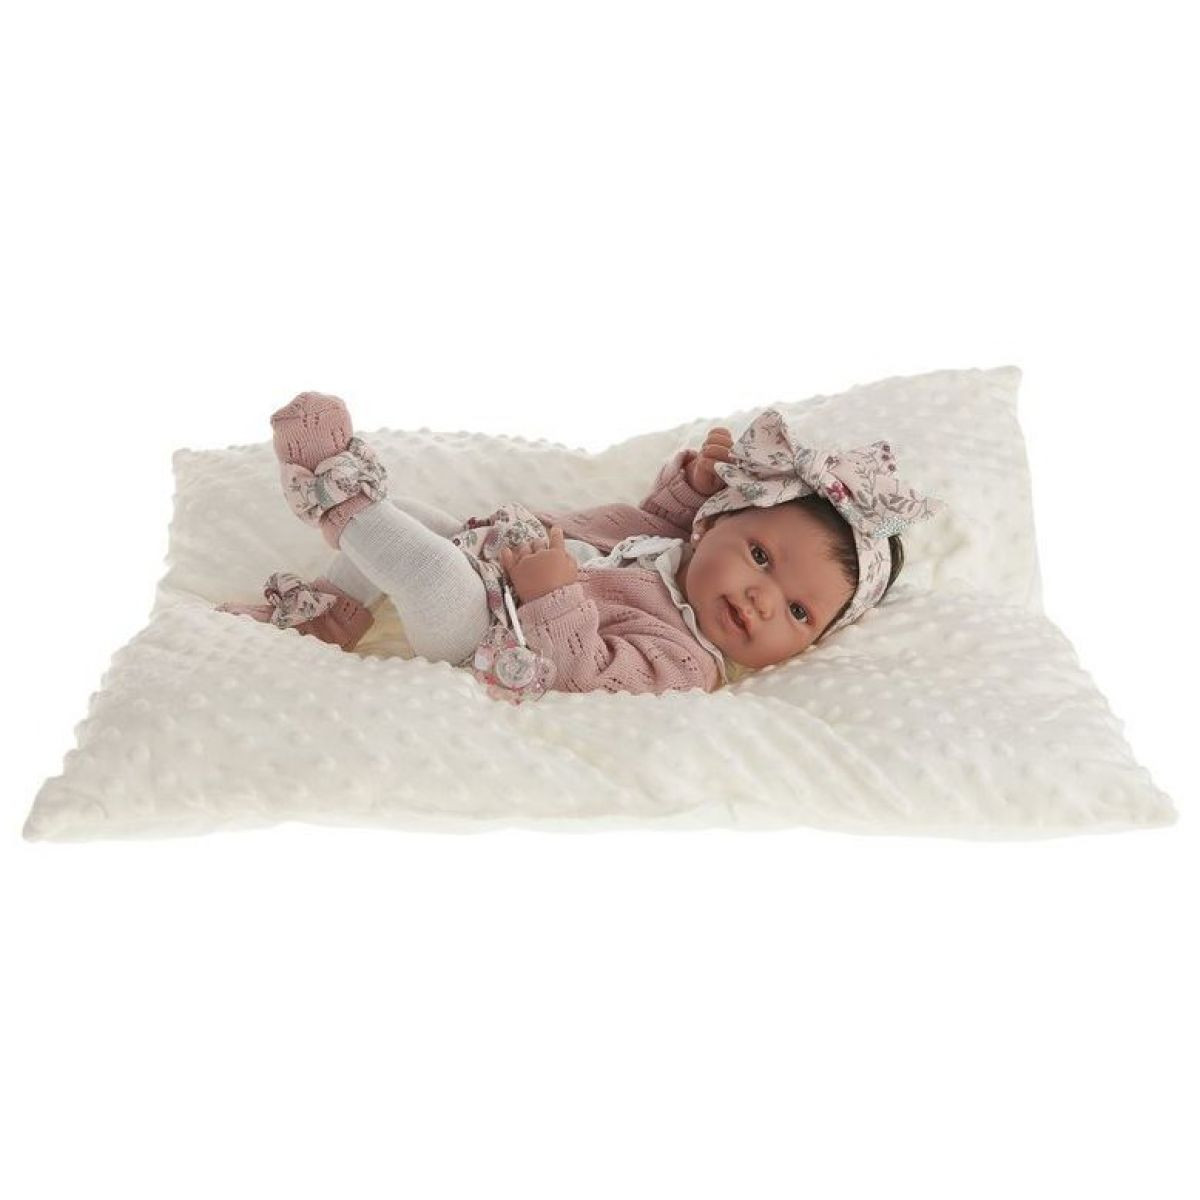 Antonio Juan 5036 Pipa realistická panenka miminko s celovinylovým tělem 42 cm